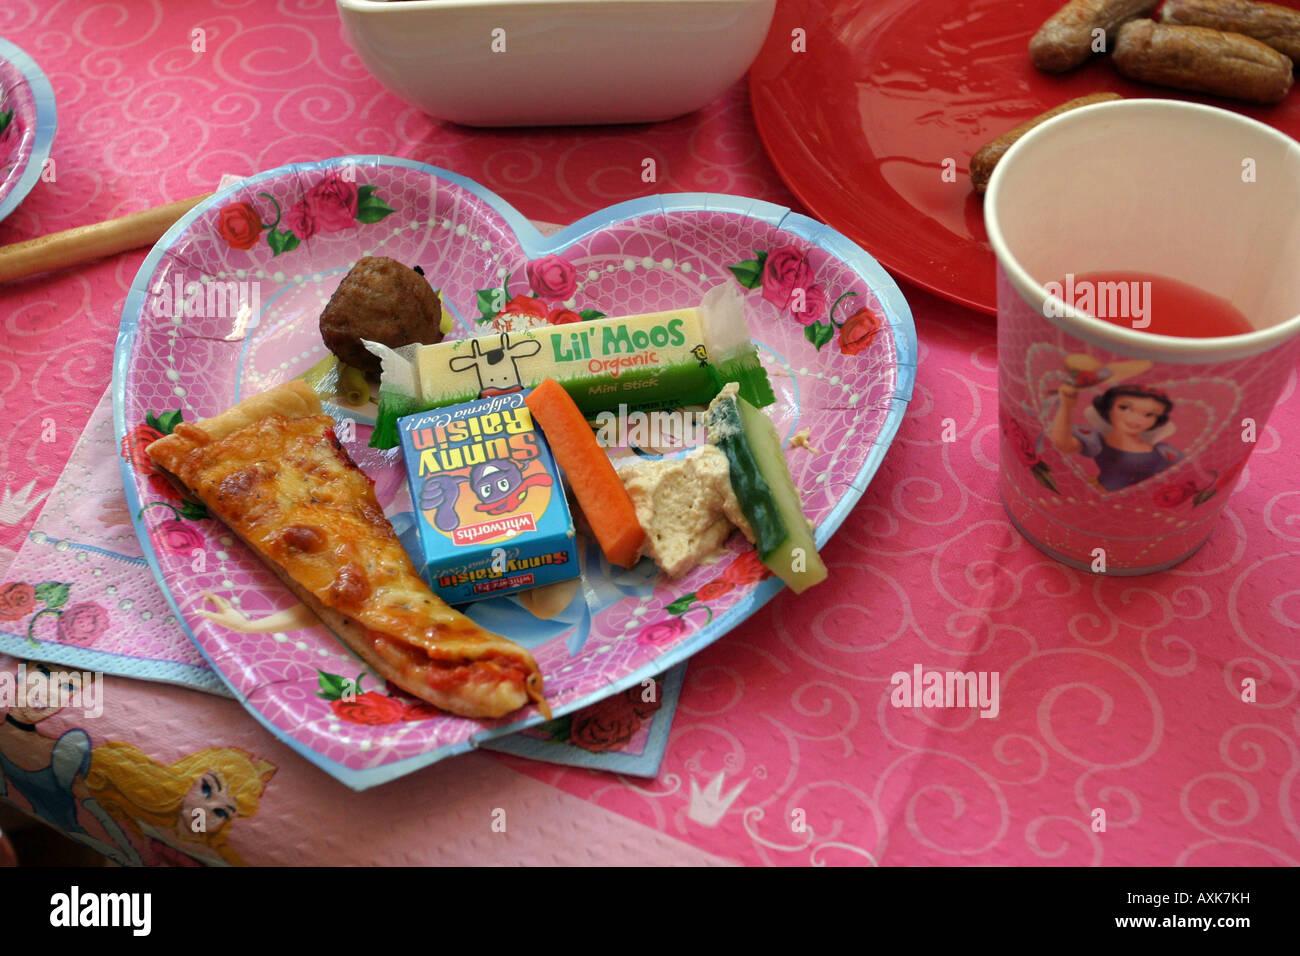 Fiesta de cumplea os de ni os comida foto imagen de - Comidas de cumpleanos infantiles ...